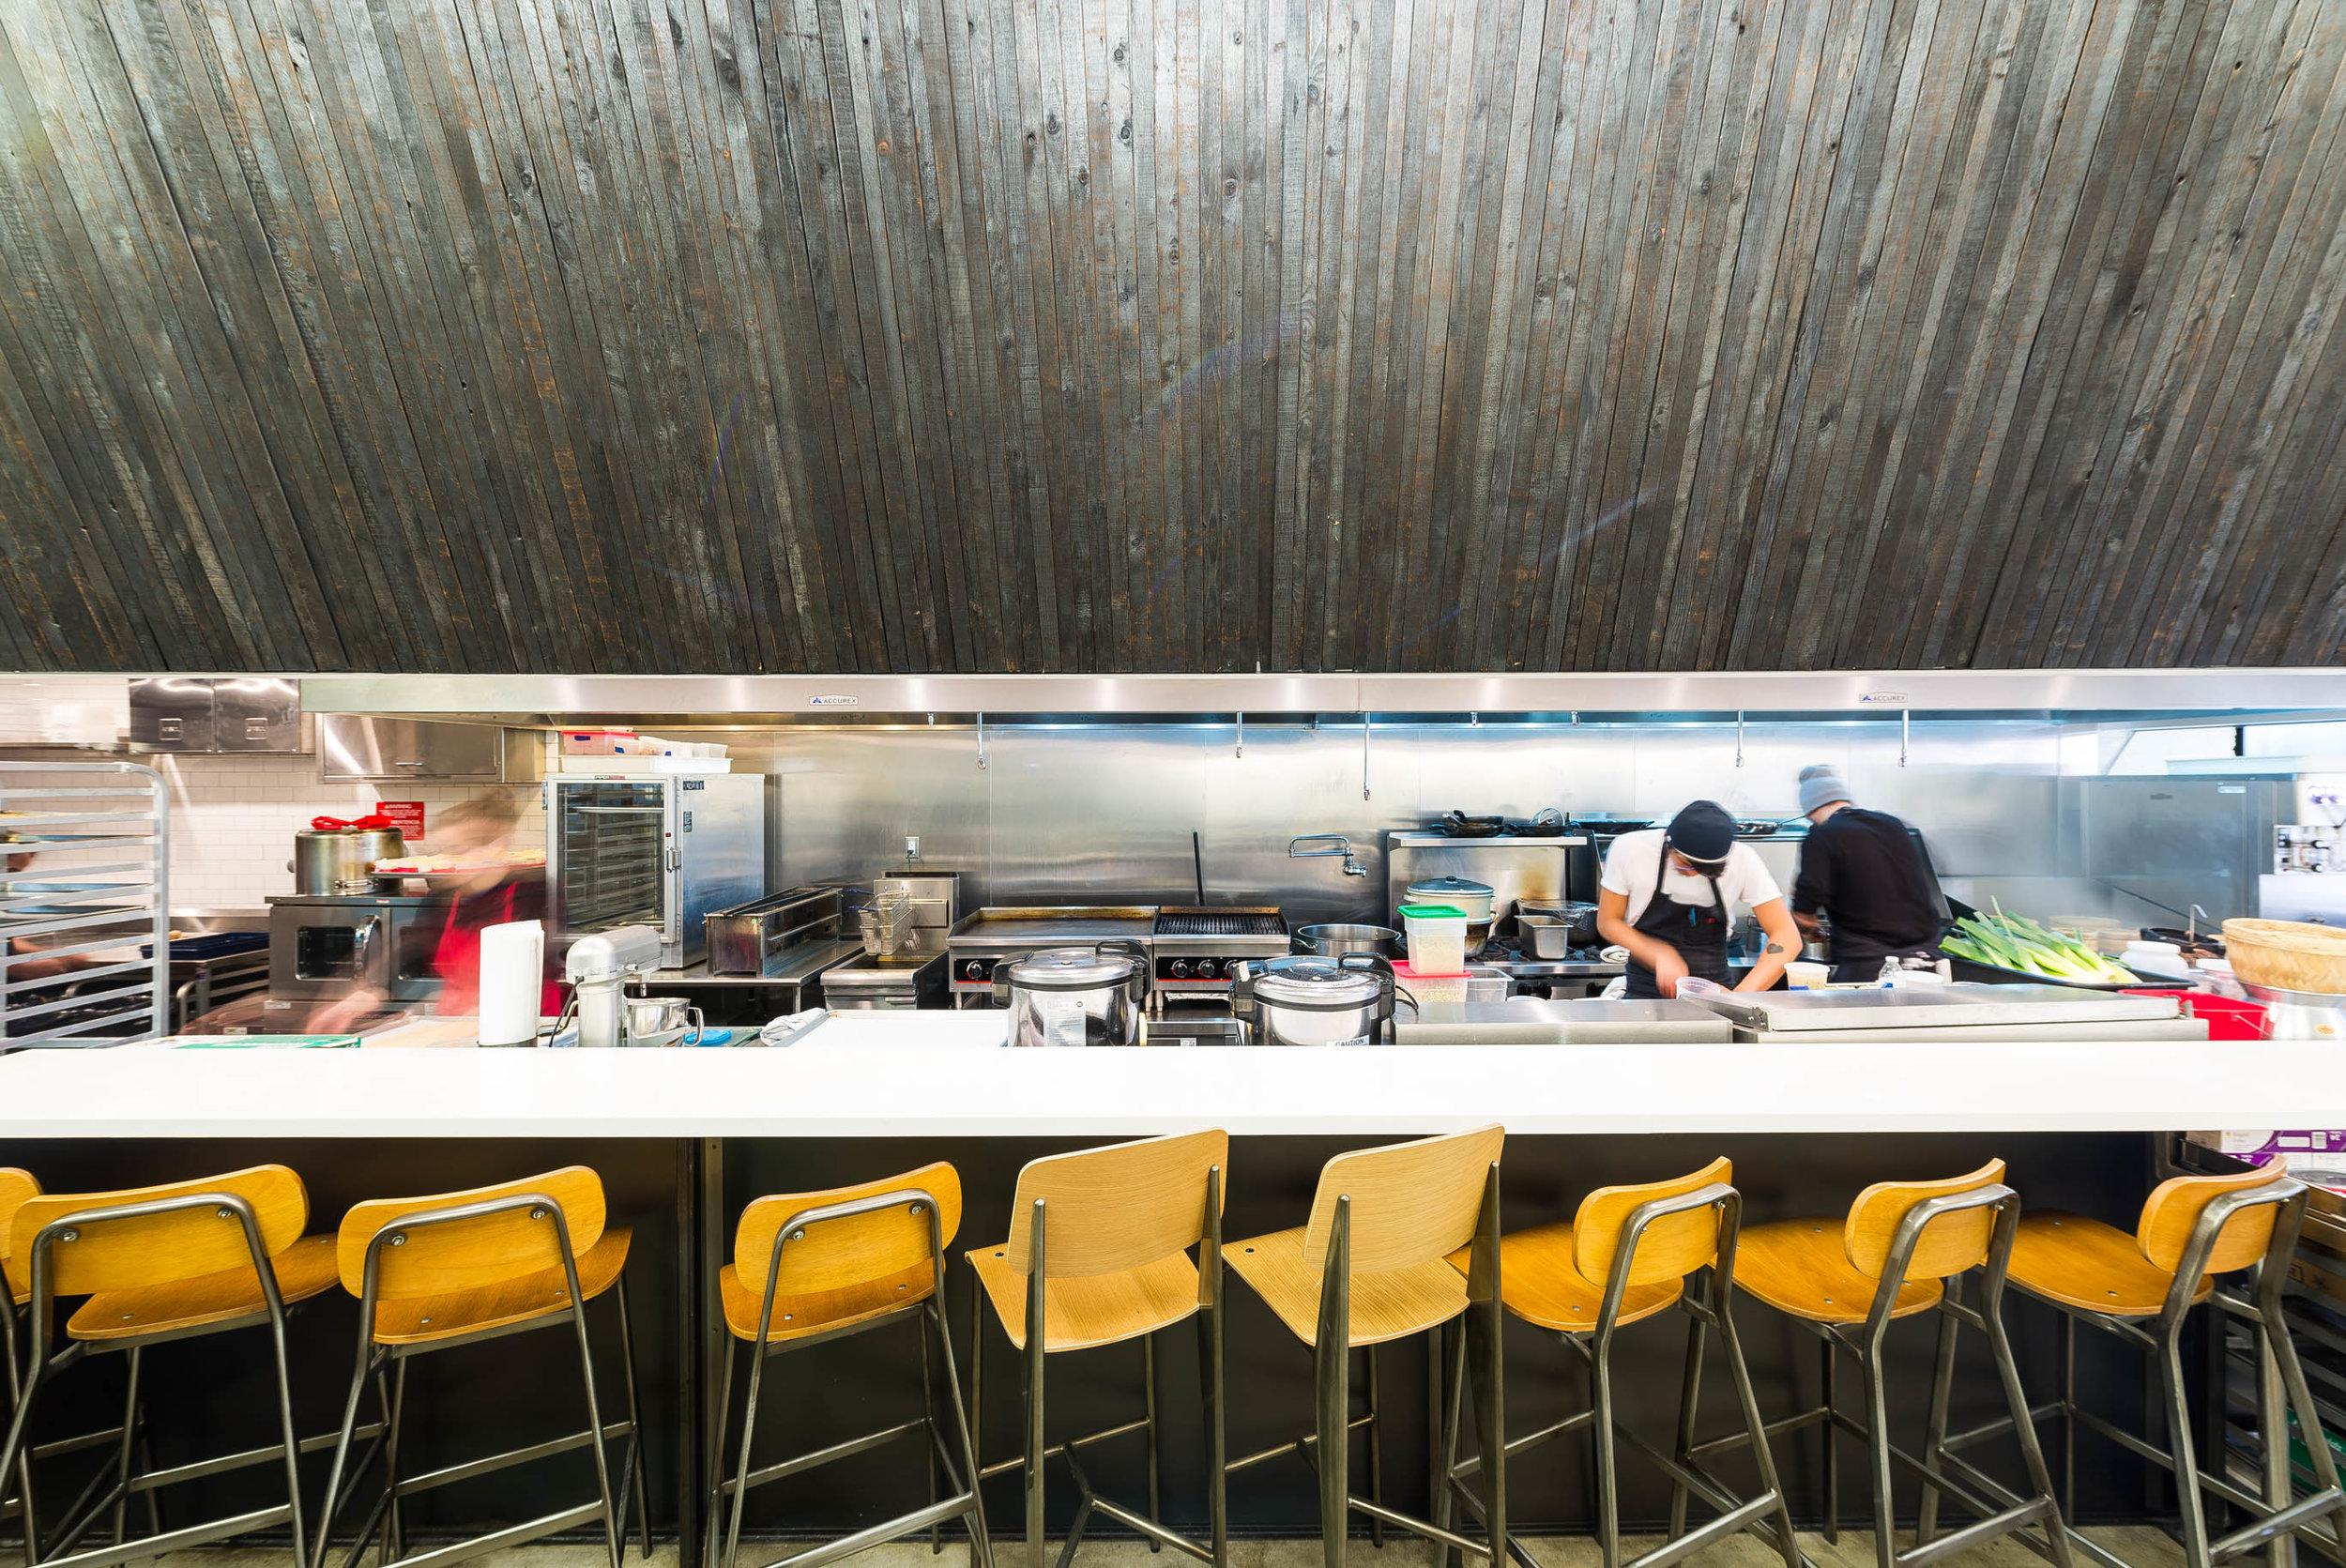 studio-saint-bars-and-restaurants-maketto-washington-dc-5